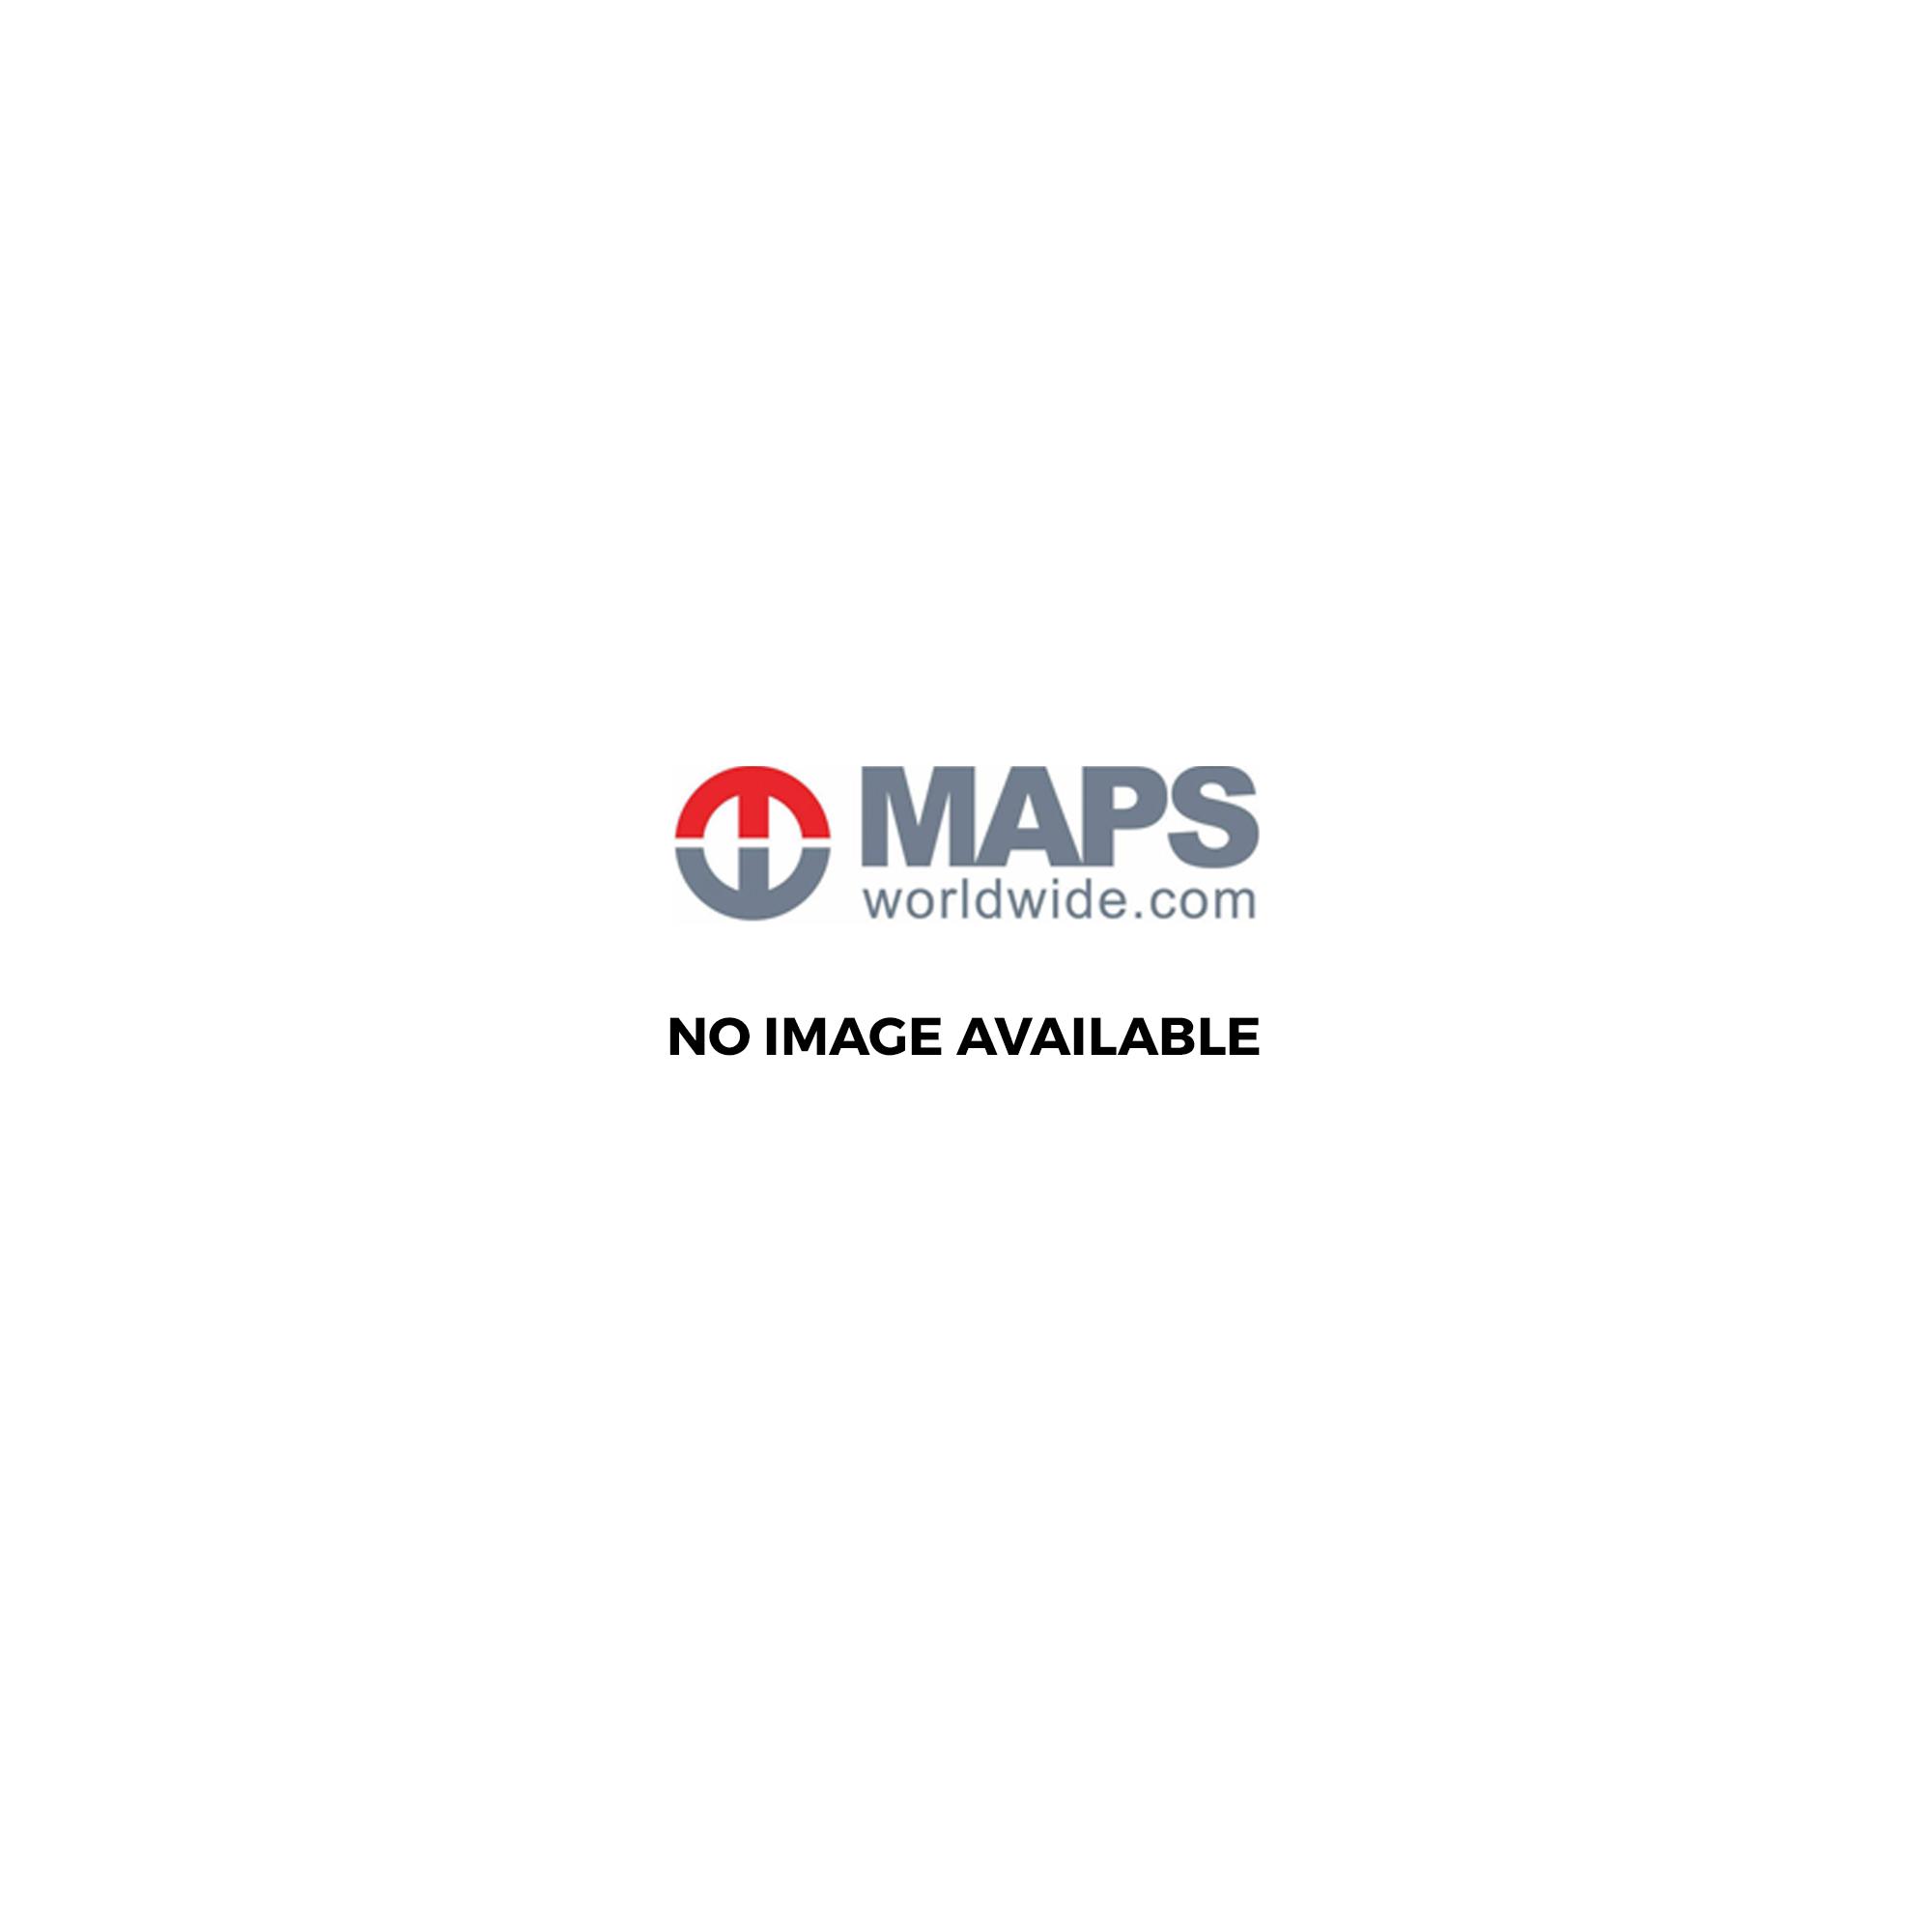 Iceland Relief Postcard on scotland world map, lesotho world map, haiti world map, ceylon world map, south korea world map, kazakhstan world map, western samoa world map, norway world map, panama world map, indonesia world map, india world map, germany world map, sri lanka world map, ireland world map, guam world map, cape verde world map, antartica world map, japan world map, british isles world map, austria world map,